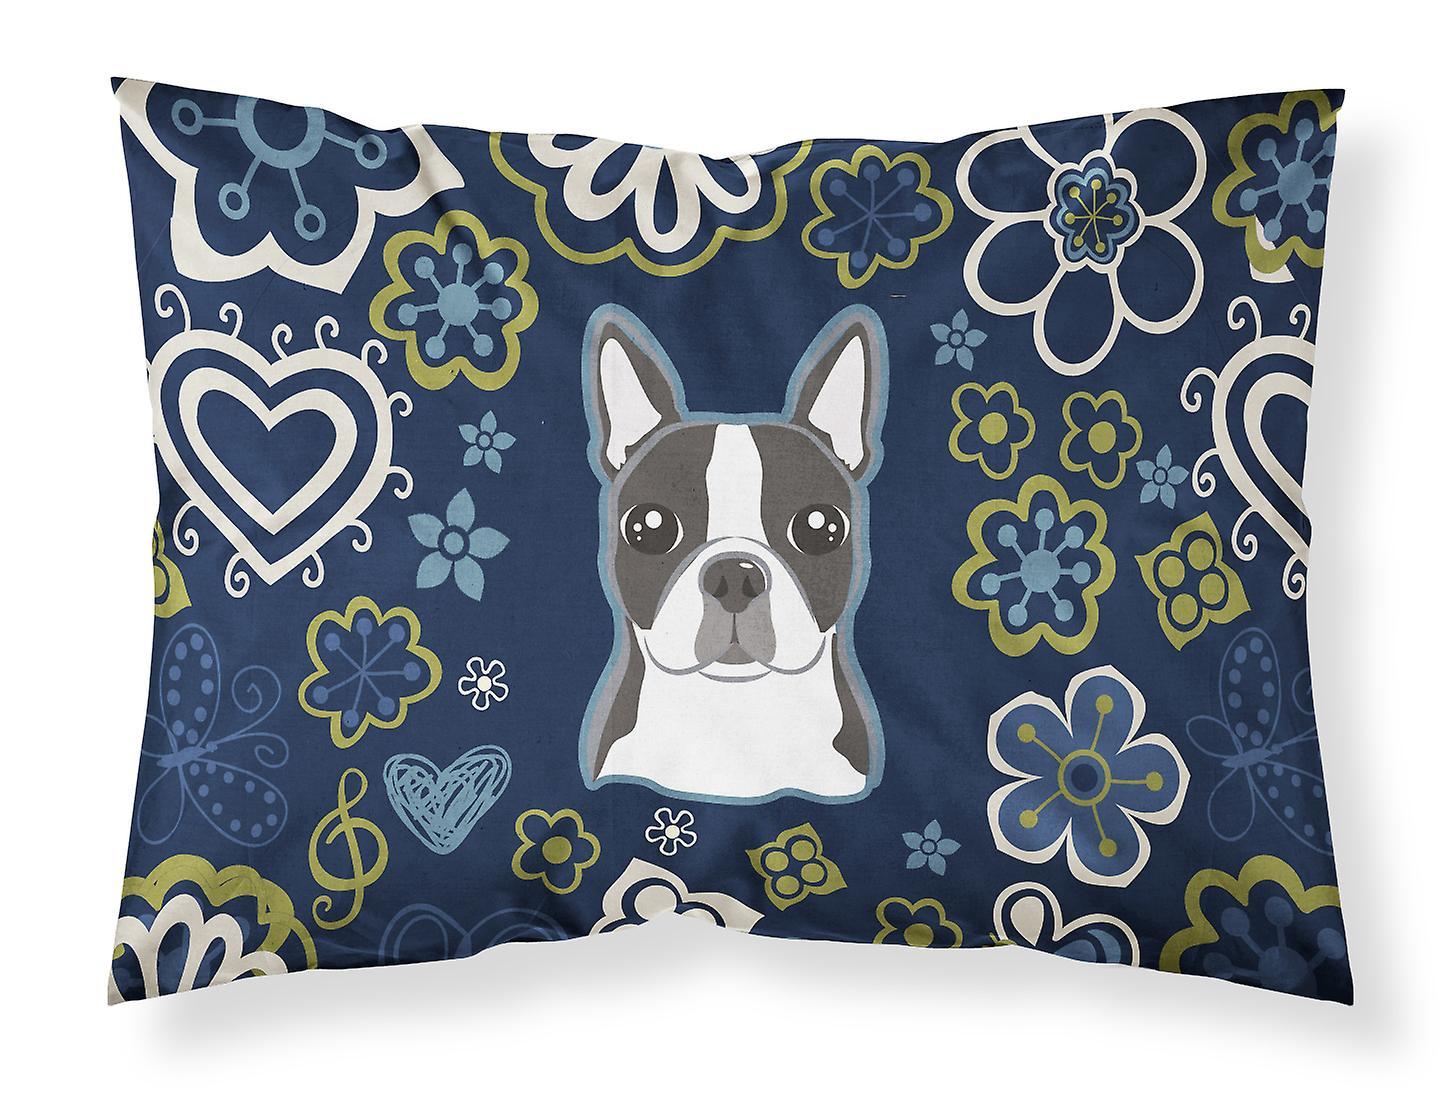 Fleurs De Taie Terrier D'oreiller Bleues Boston Standard Tissu yNnwOm0Pv8